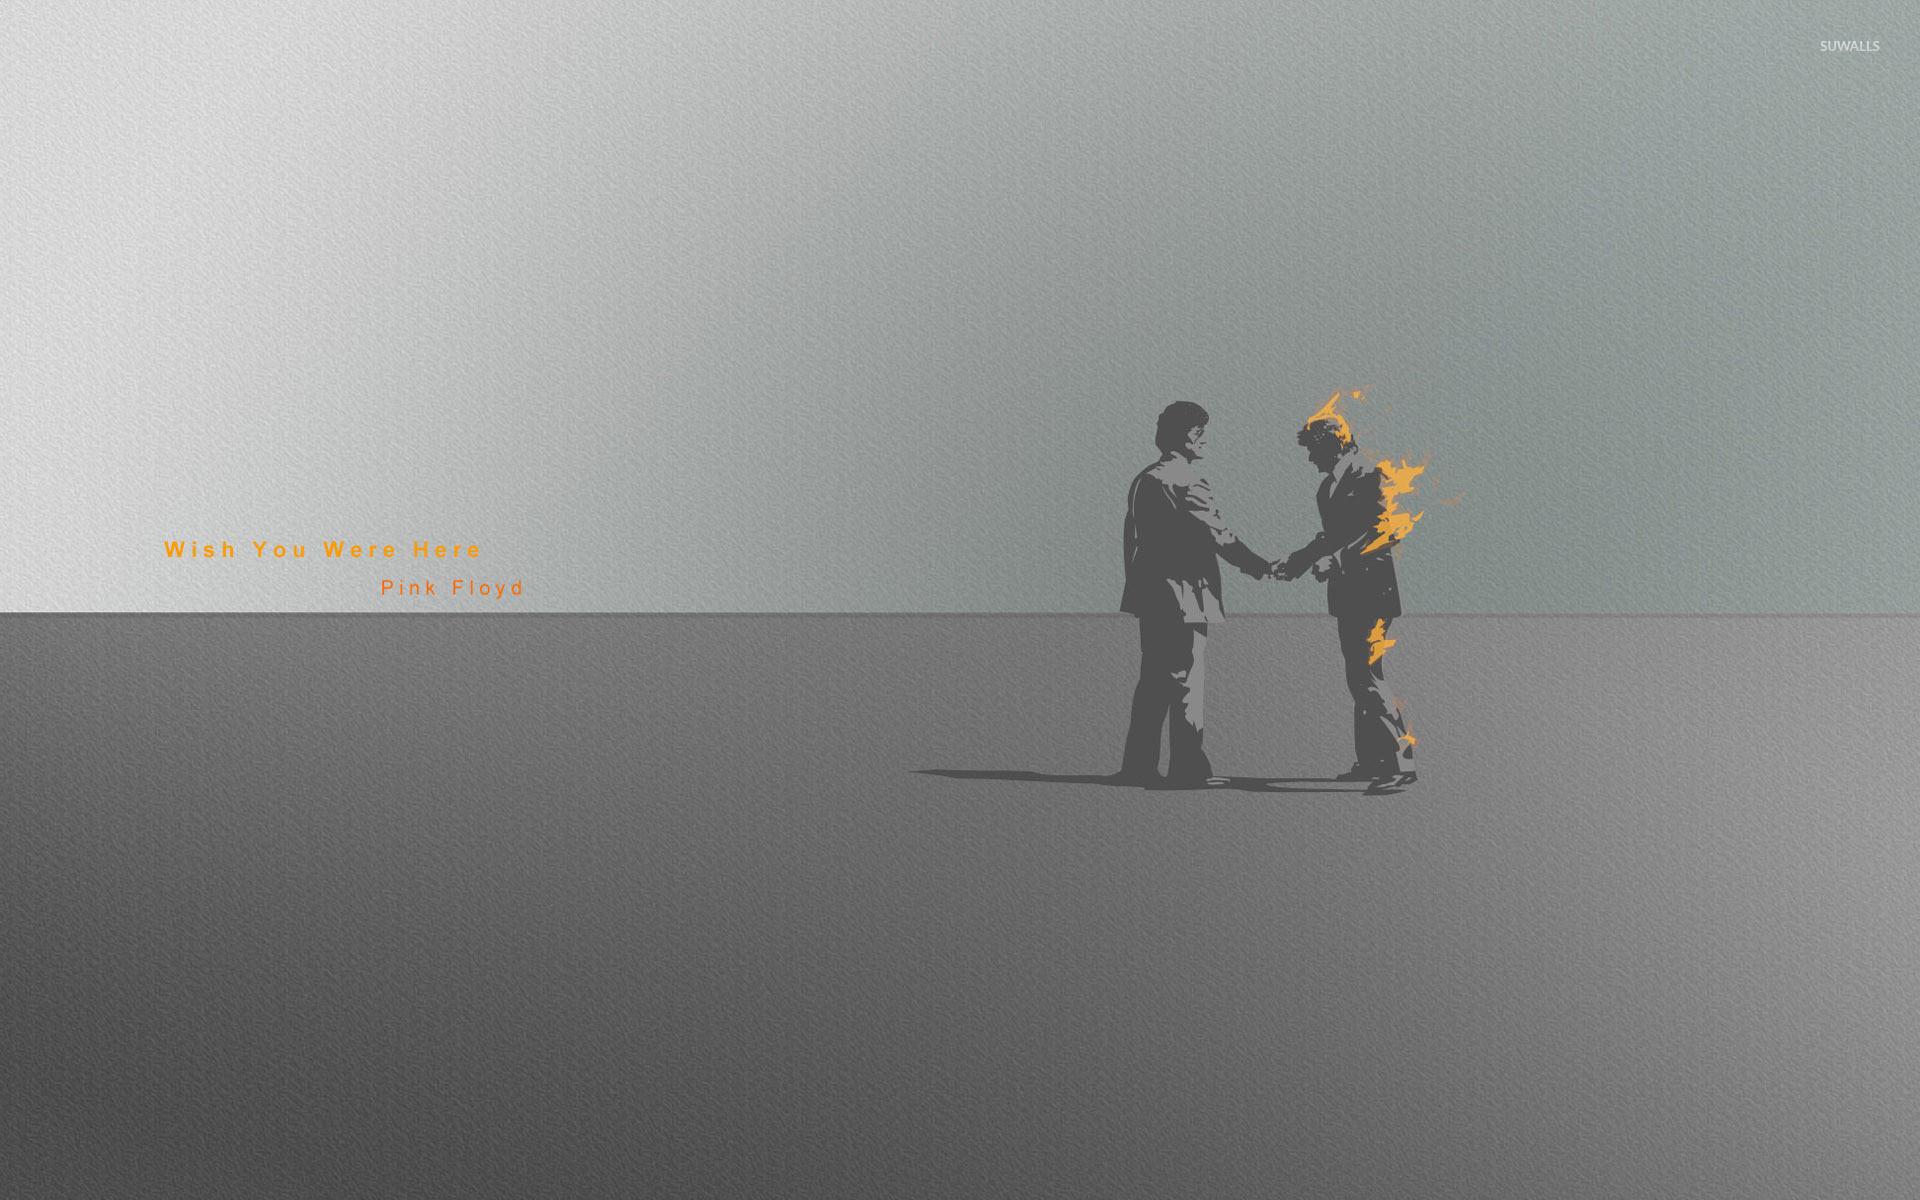 Pink Floyd – Wish You Were Here wallpaper jpg